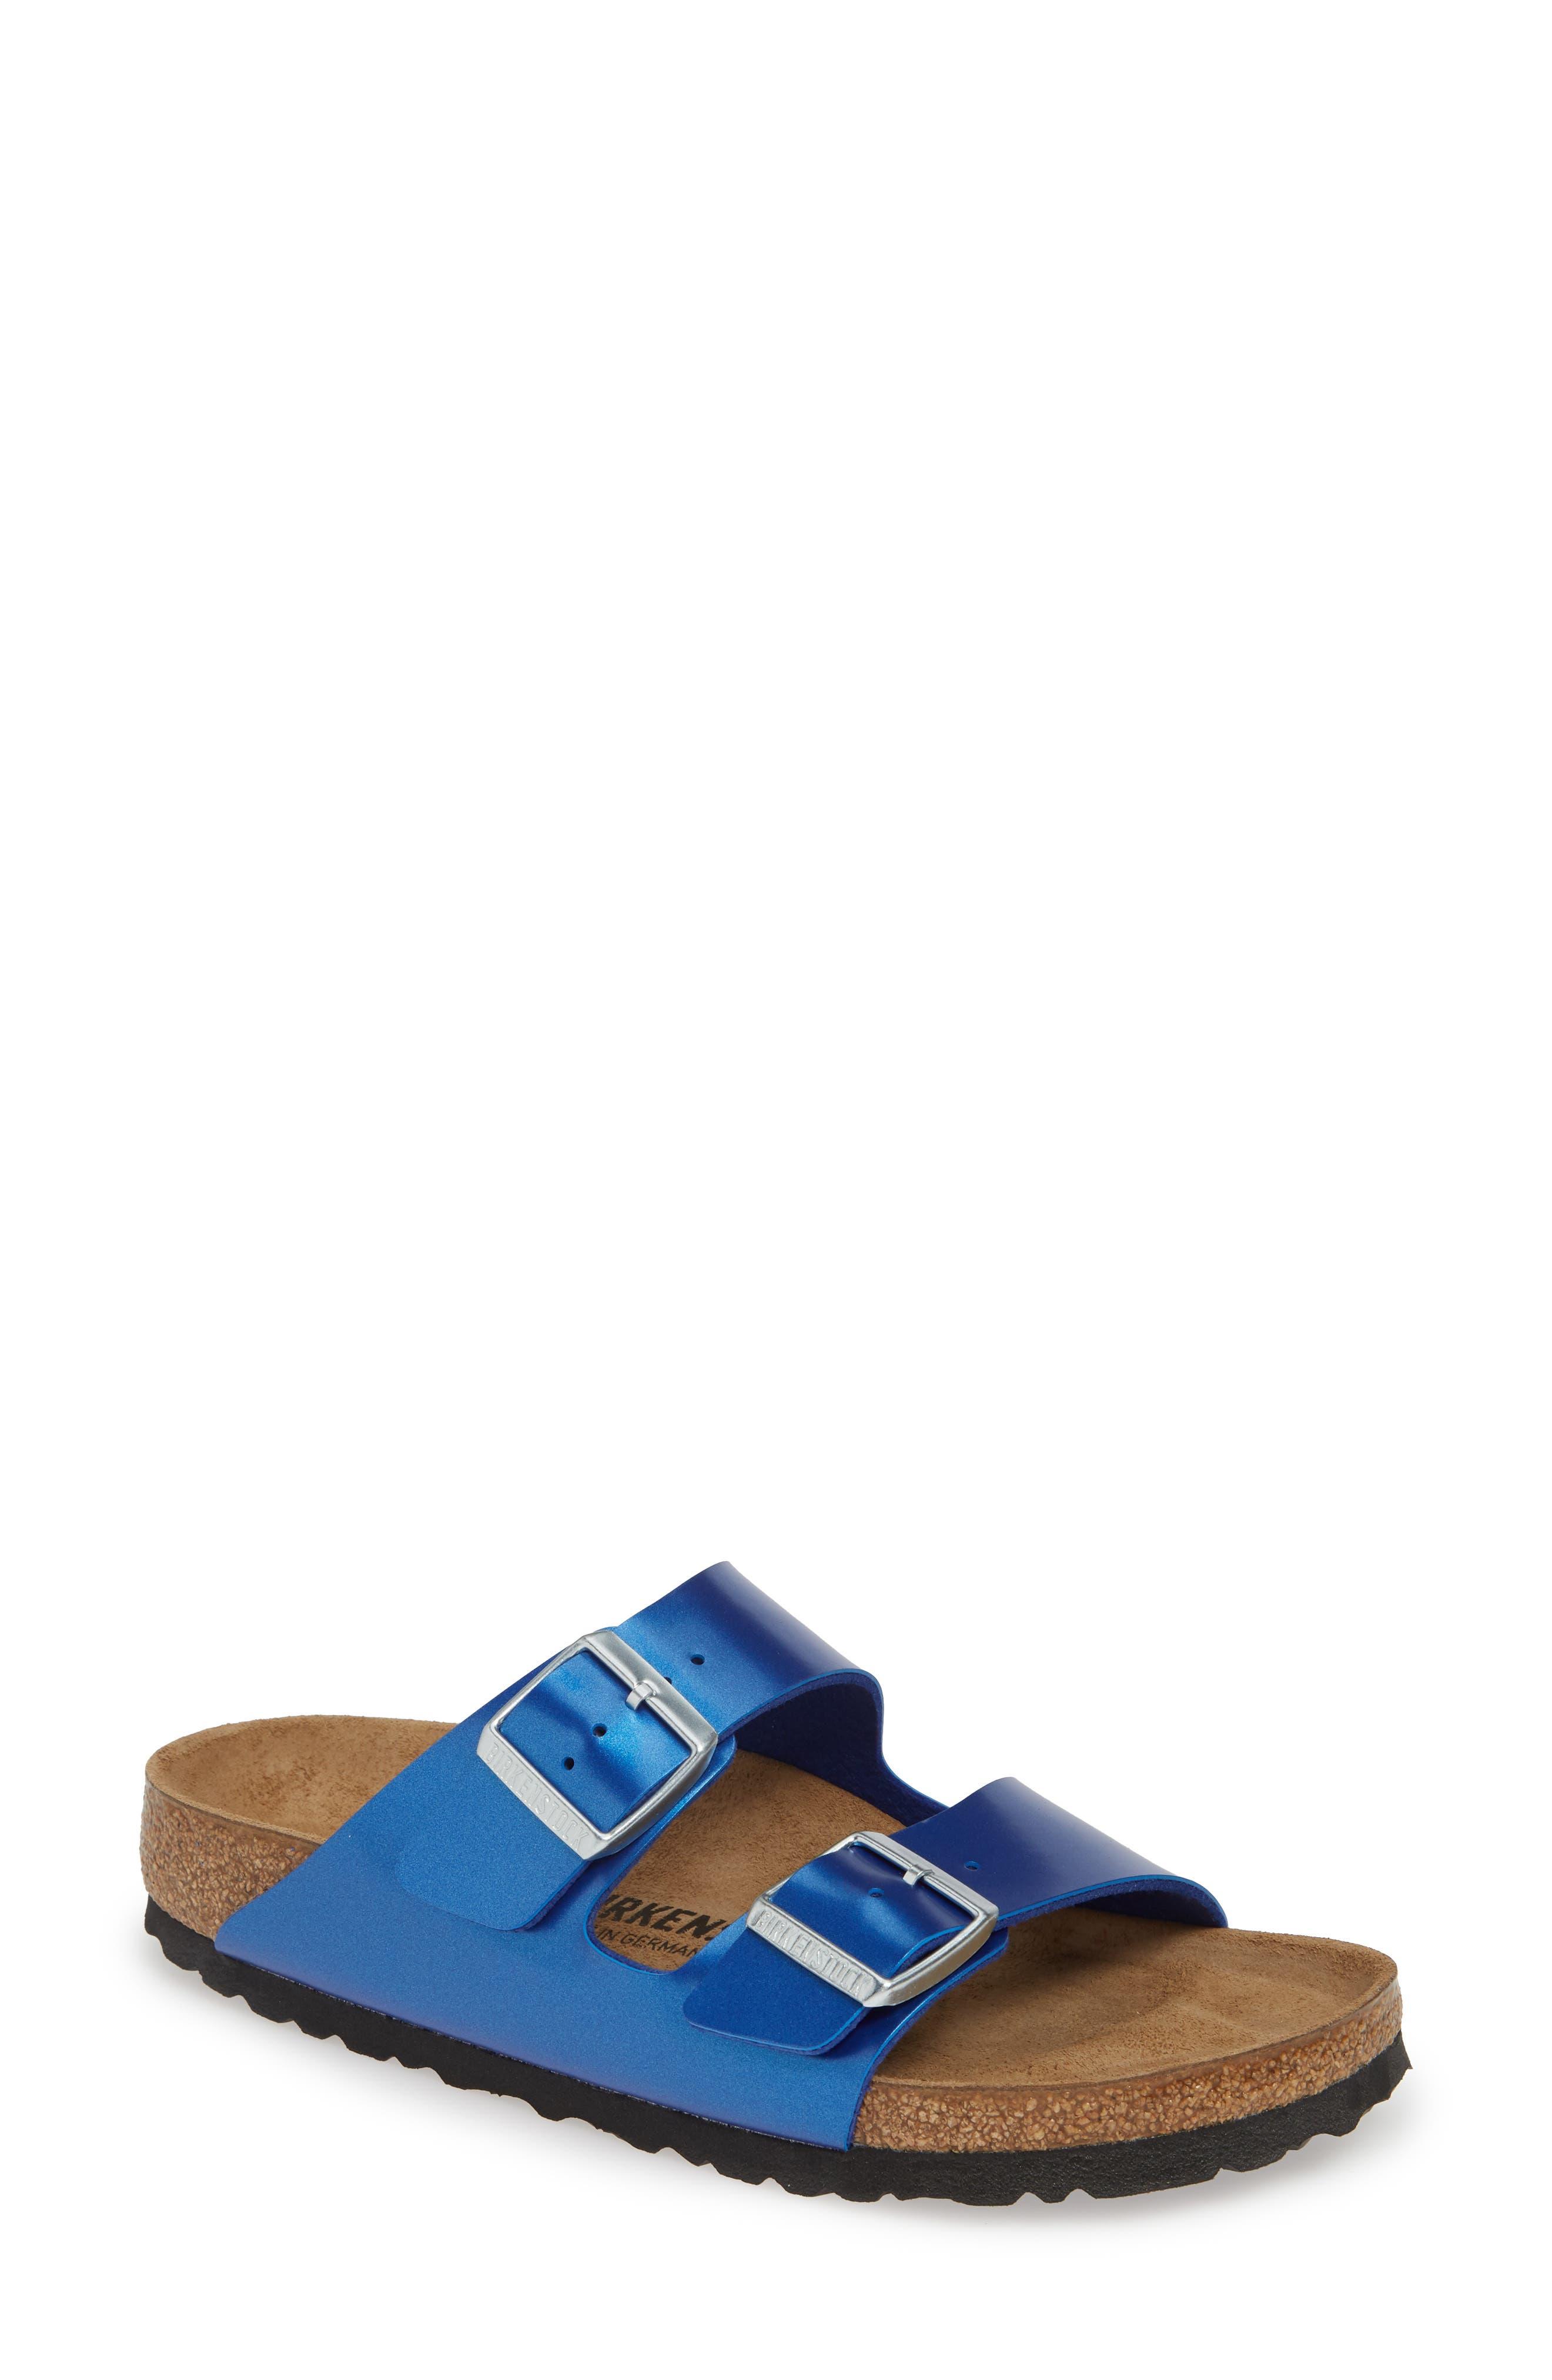 Birkenstock Arizona Electric Slide Sandal, Blue